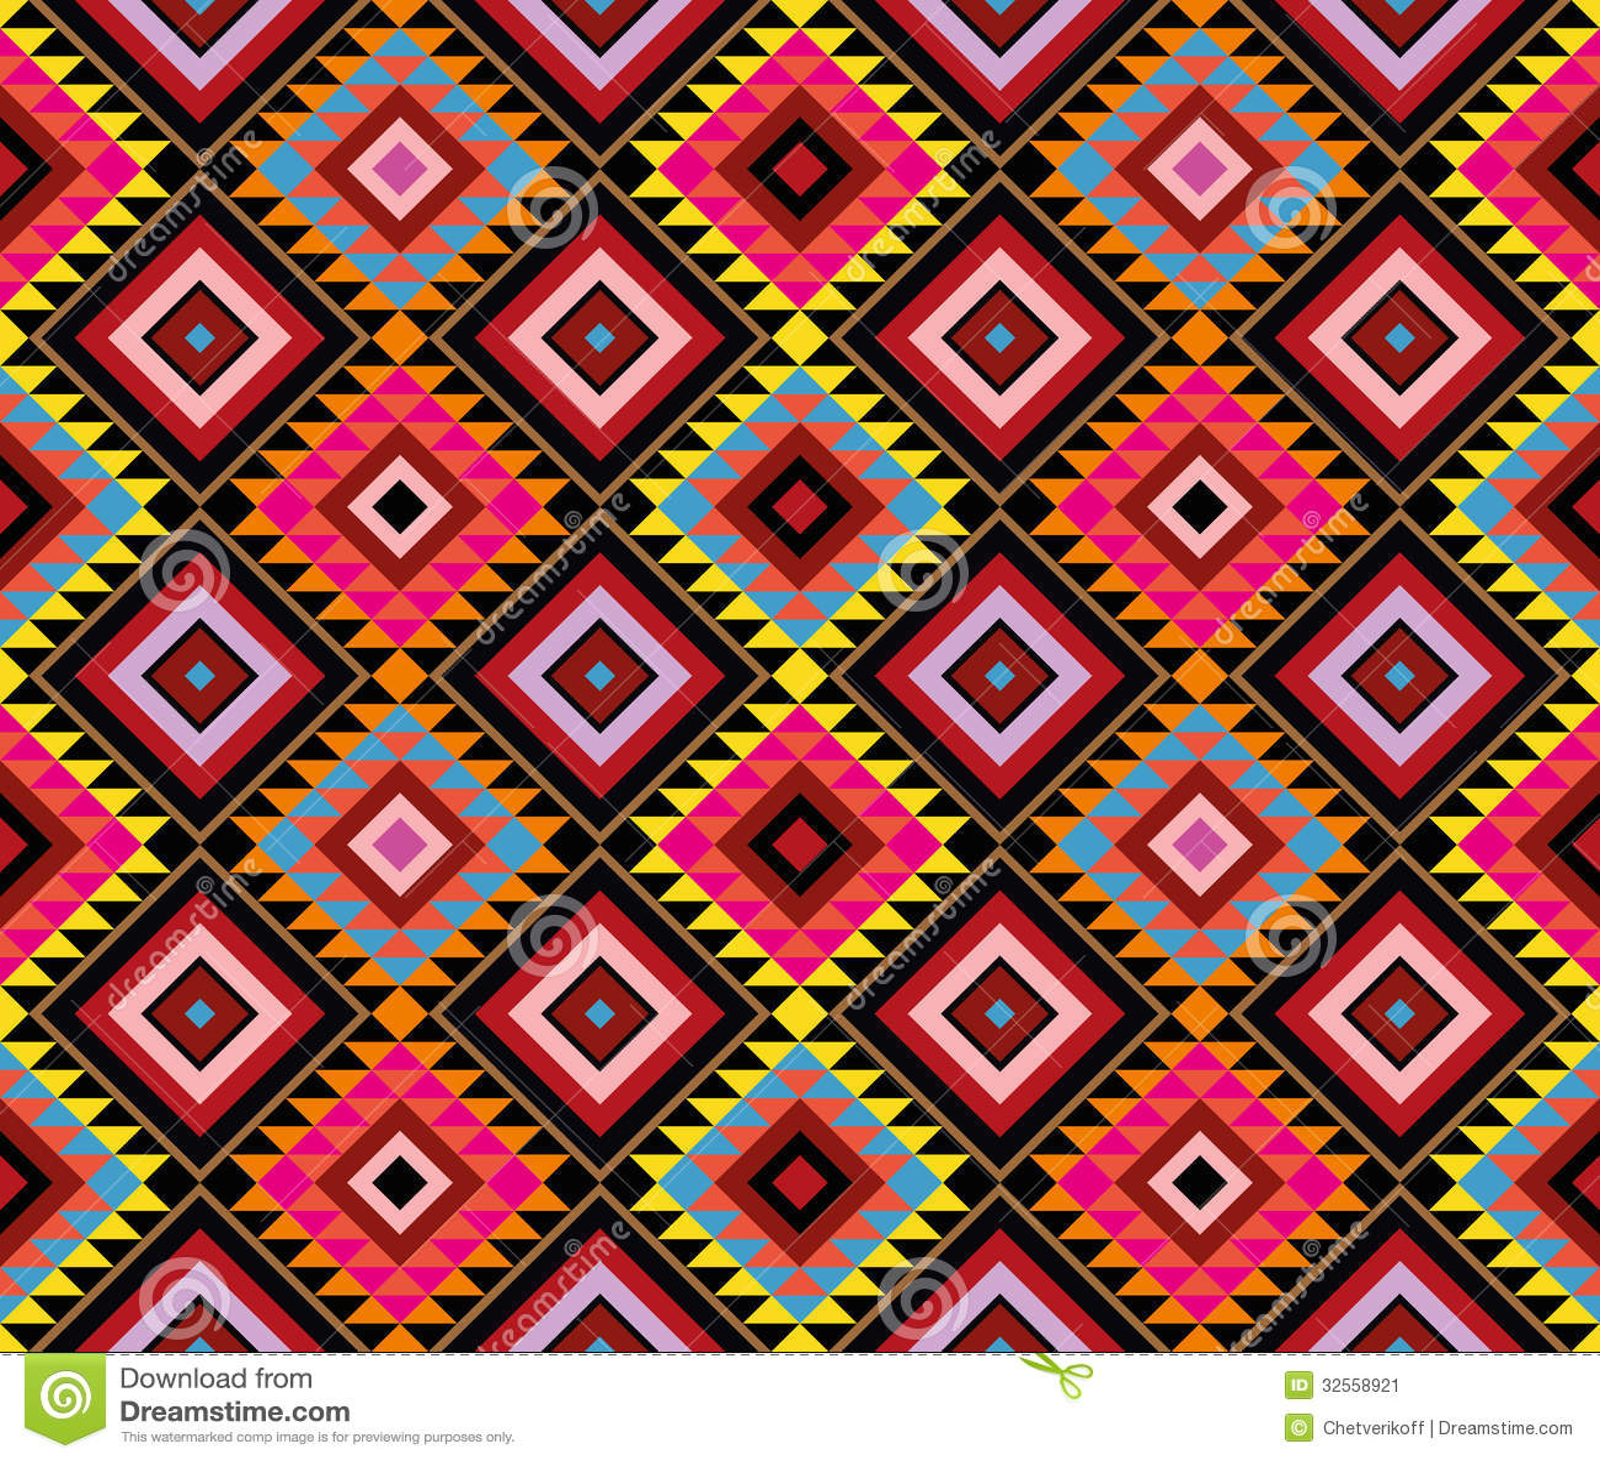 Modello indigeno